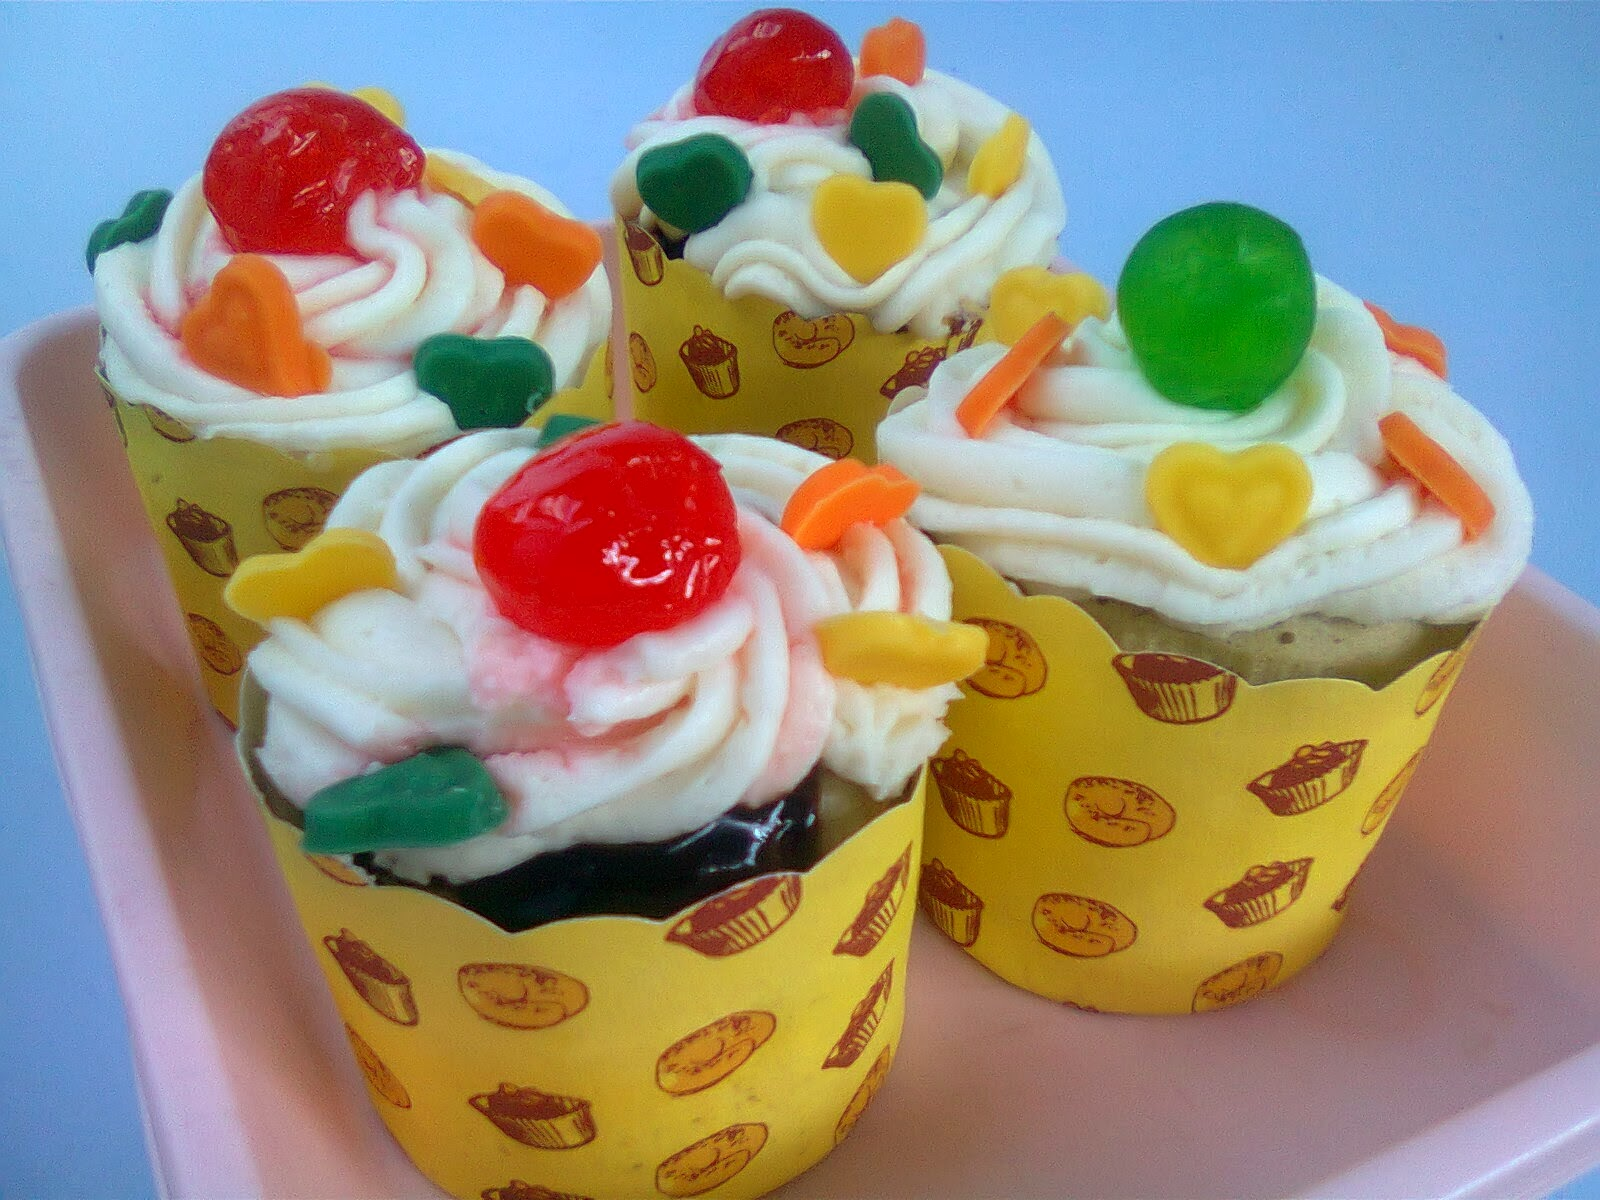 Resep Cake Yogurt Kukus: Resep Cupcake Kukus Hias Buah